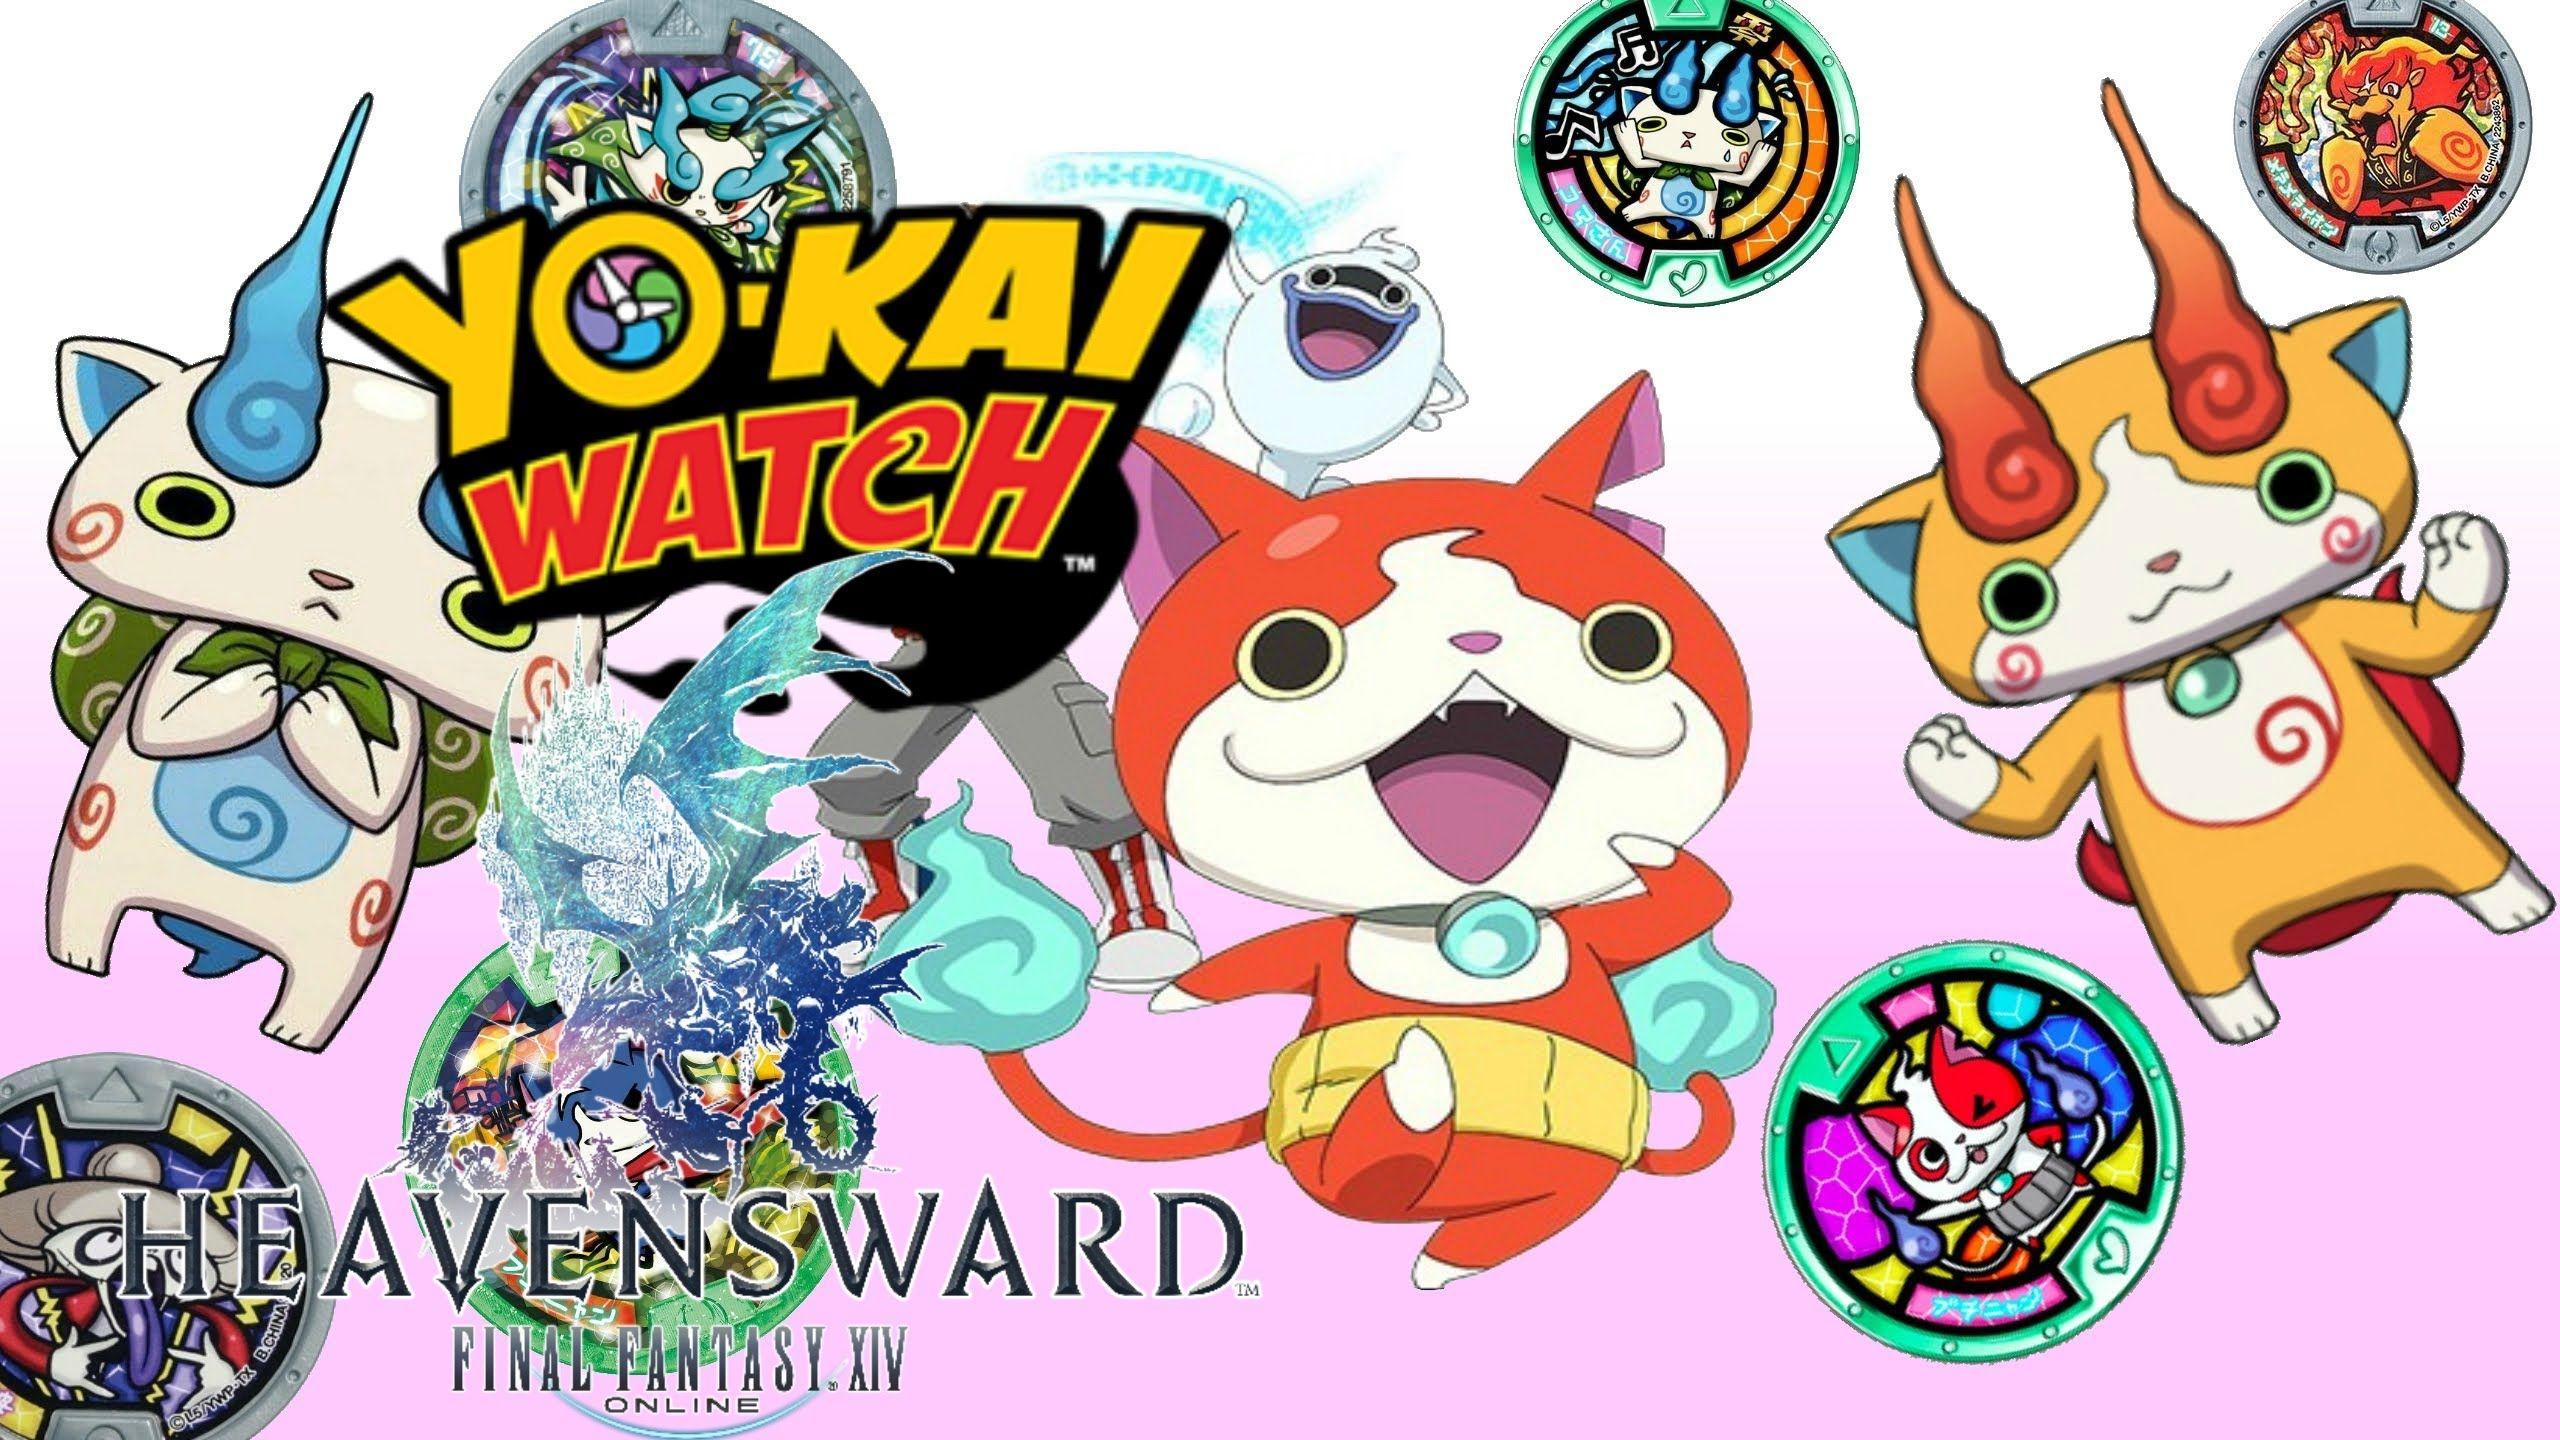 Showcasing the YoKai Watch event items! Final fantasy